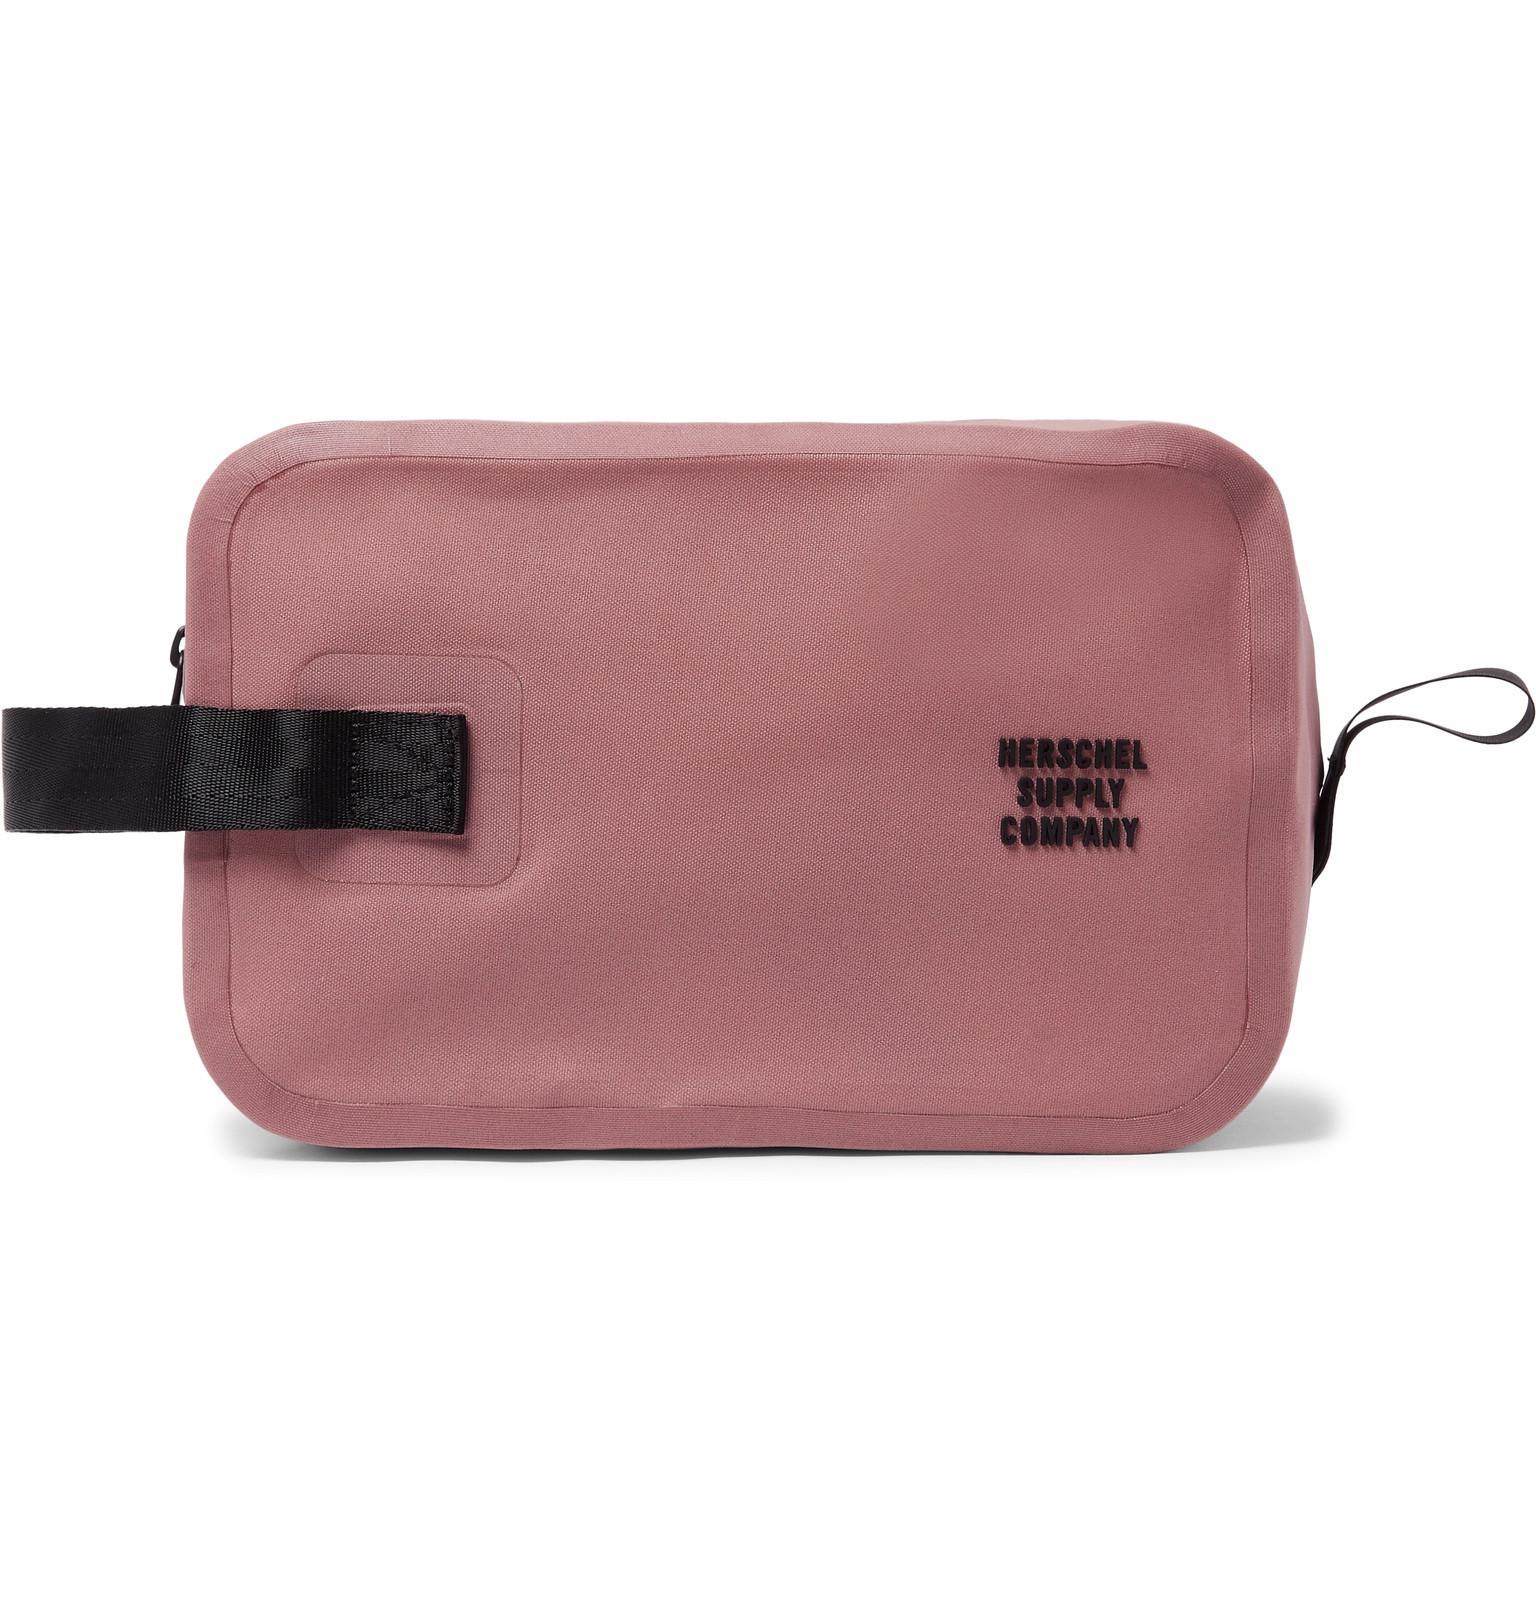 016d5d63e83e Herschel Supply Co. Chapter Tarpaulin Wash Bag in Pink for Men - Lyst